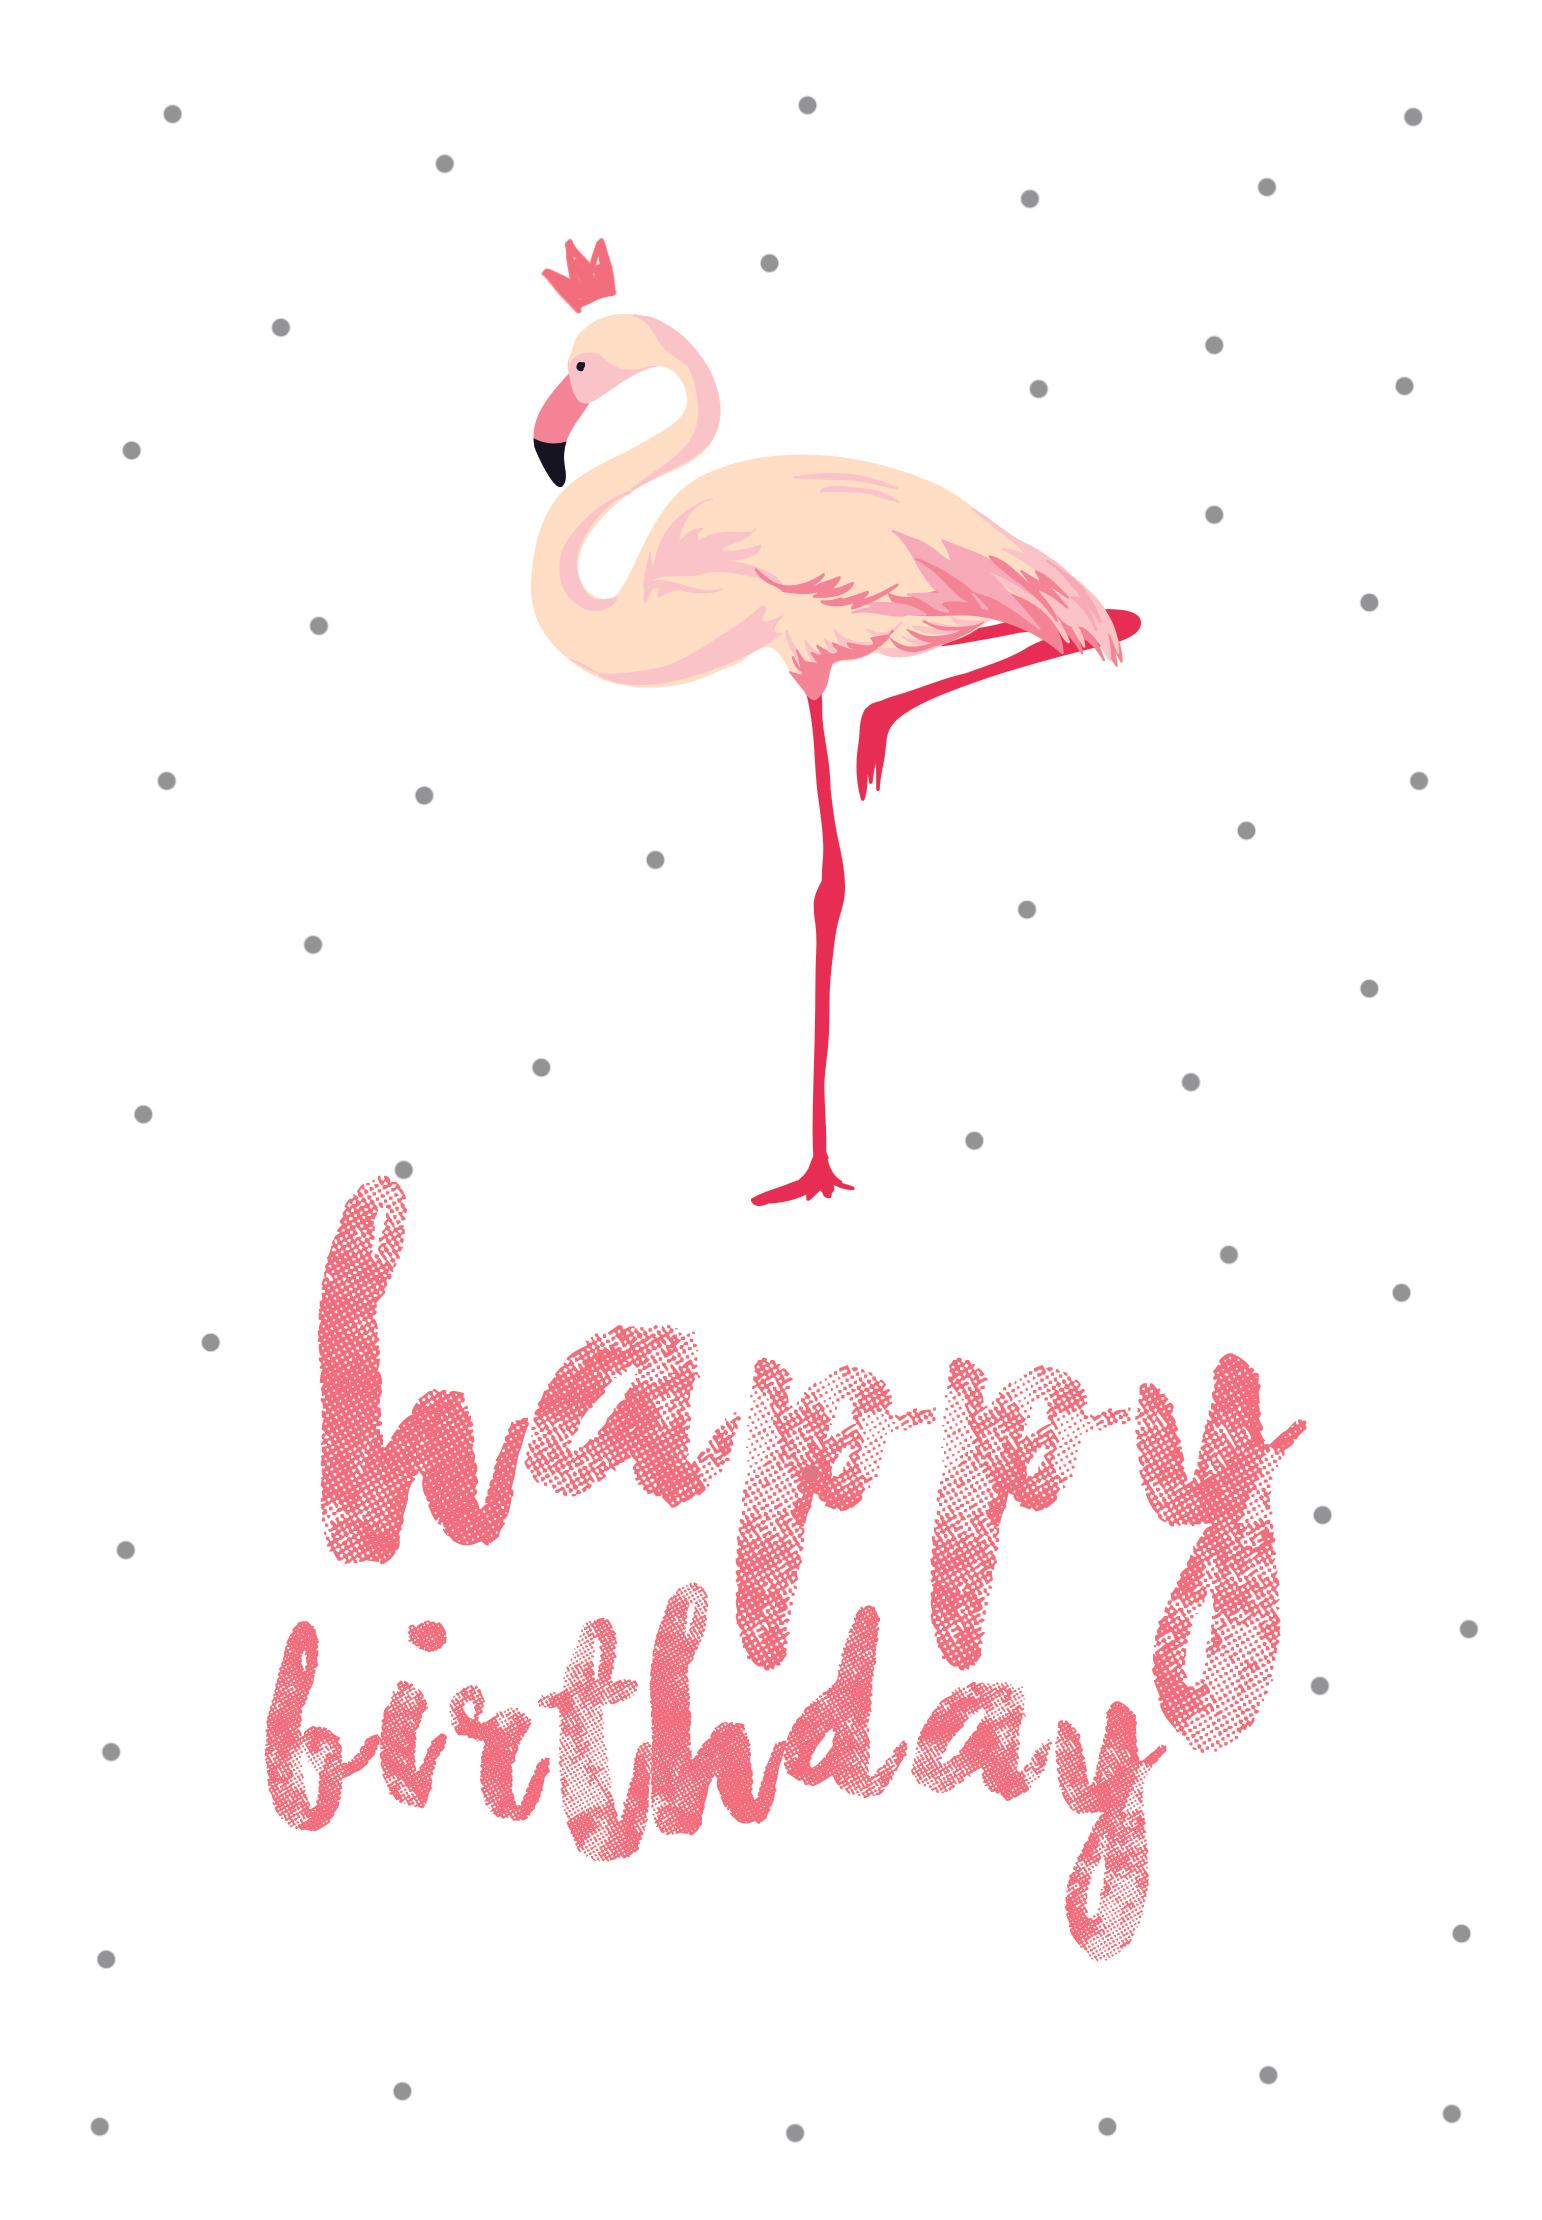 Flamingo Birthday - Free Printable Birthday Card | Greetings Island - Free Printable Birthday Cards For Wife